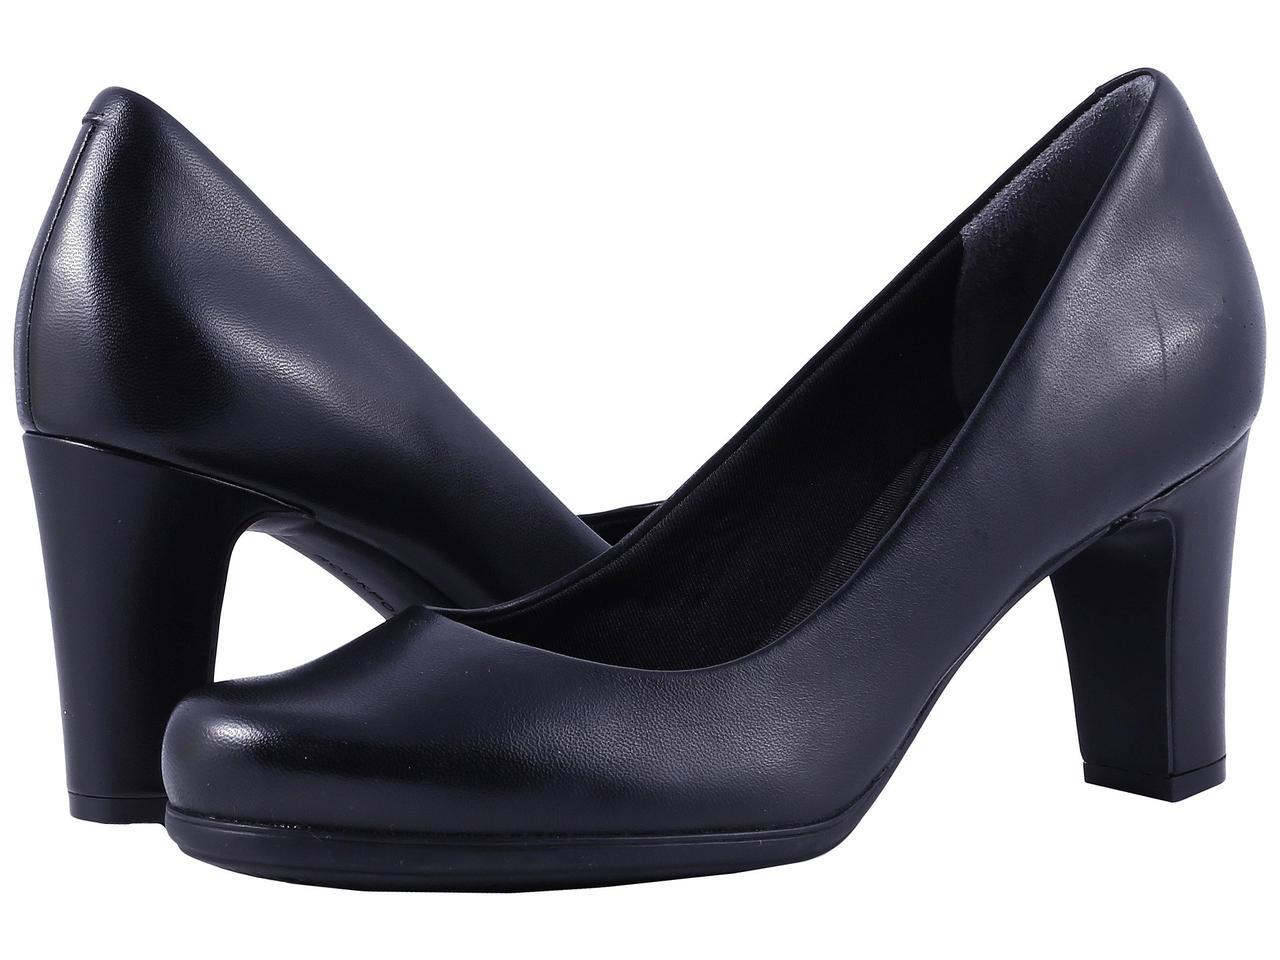 Туфли на каблуке (Оригинал) Rockport Total Motion 75mm Plain Pump Black Leather